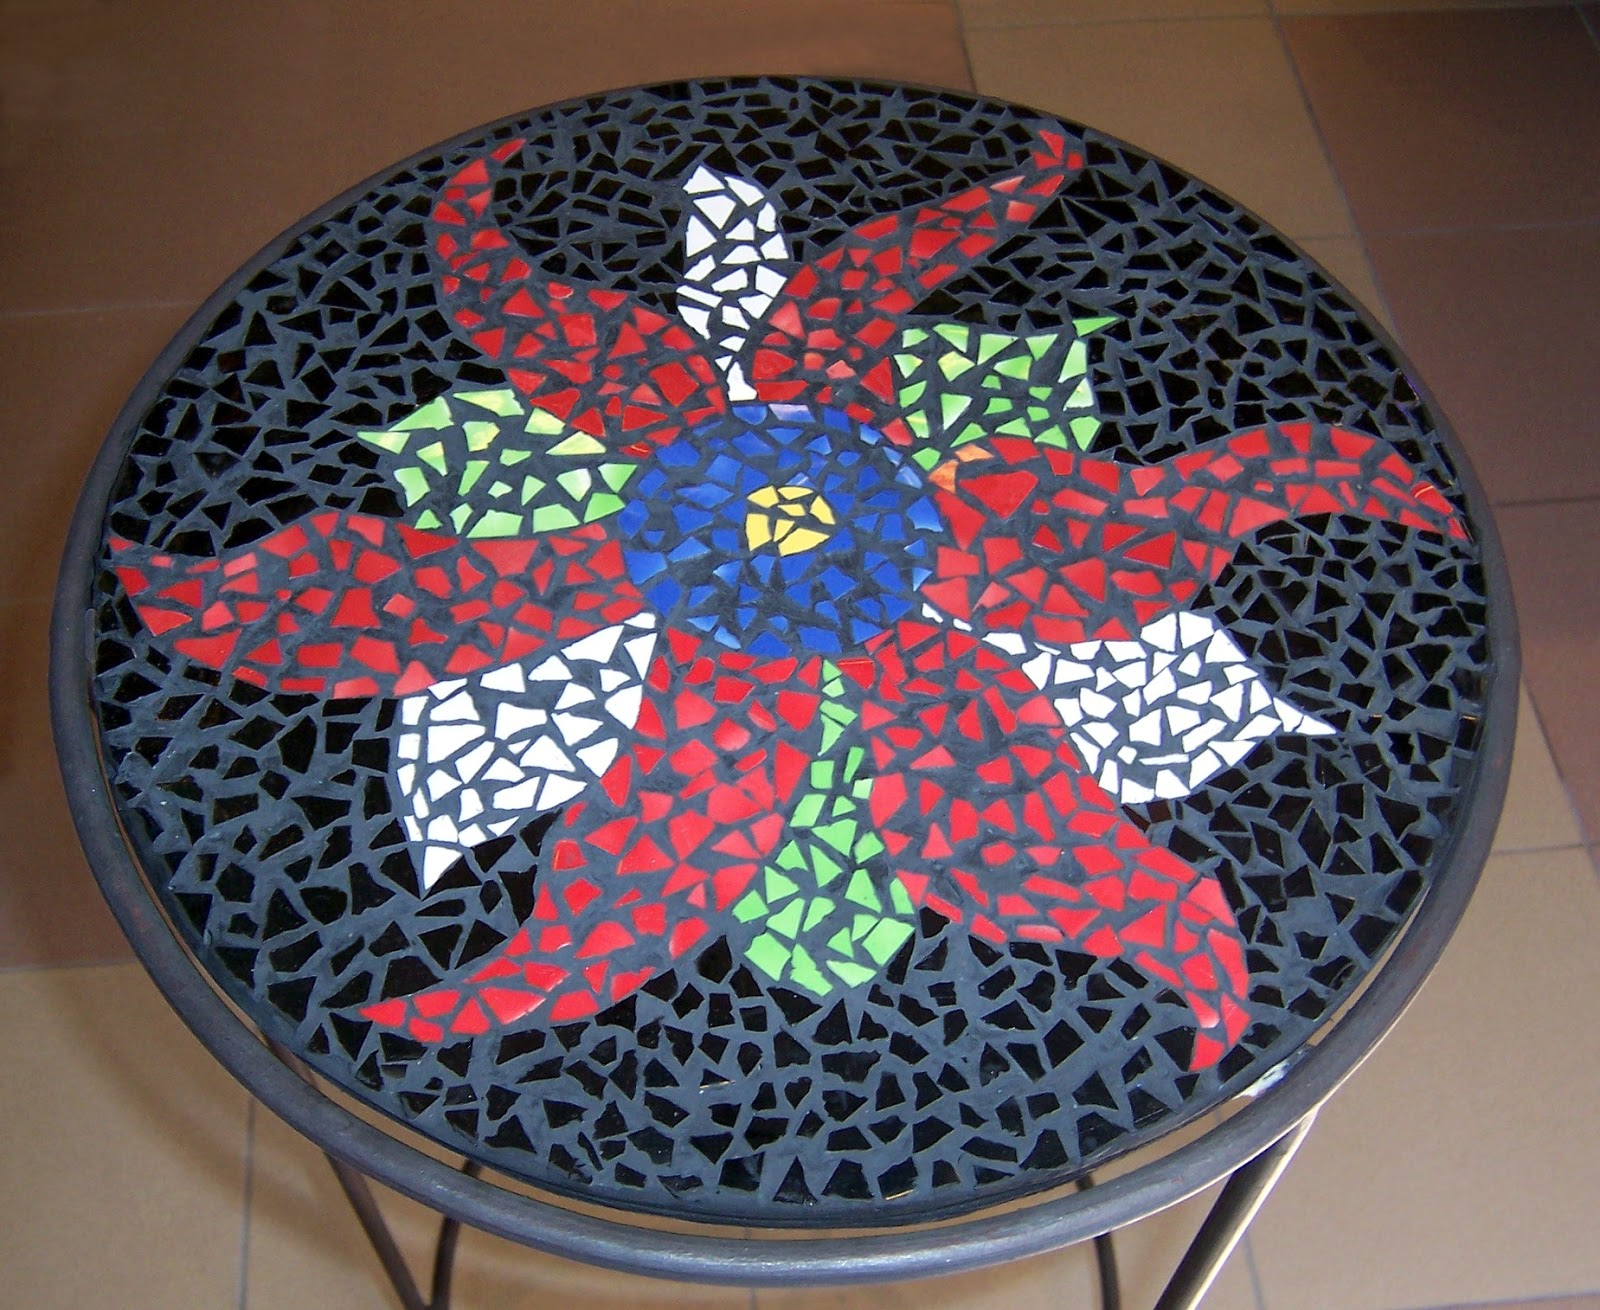 Taller de montevideo cursos de mosaico para adultos y ni os - Mesas con azulejos ...